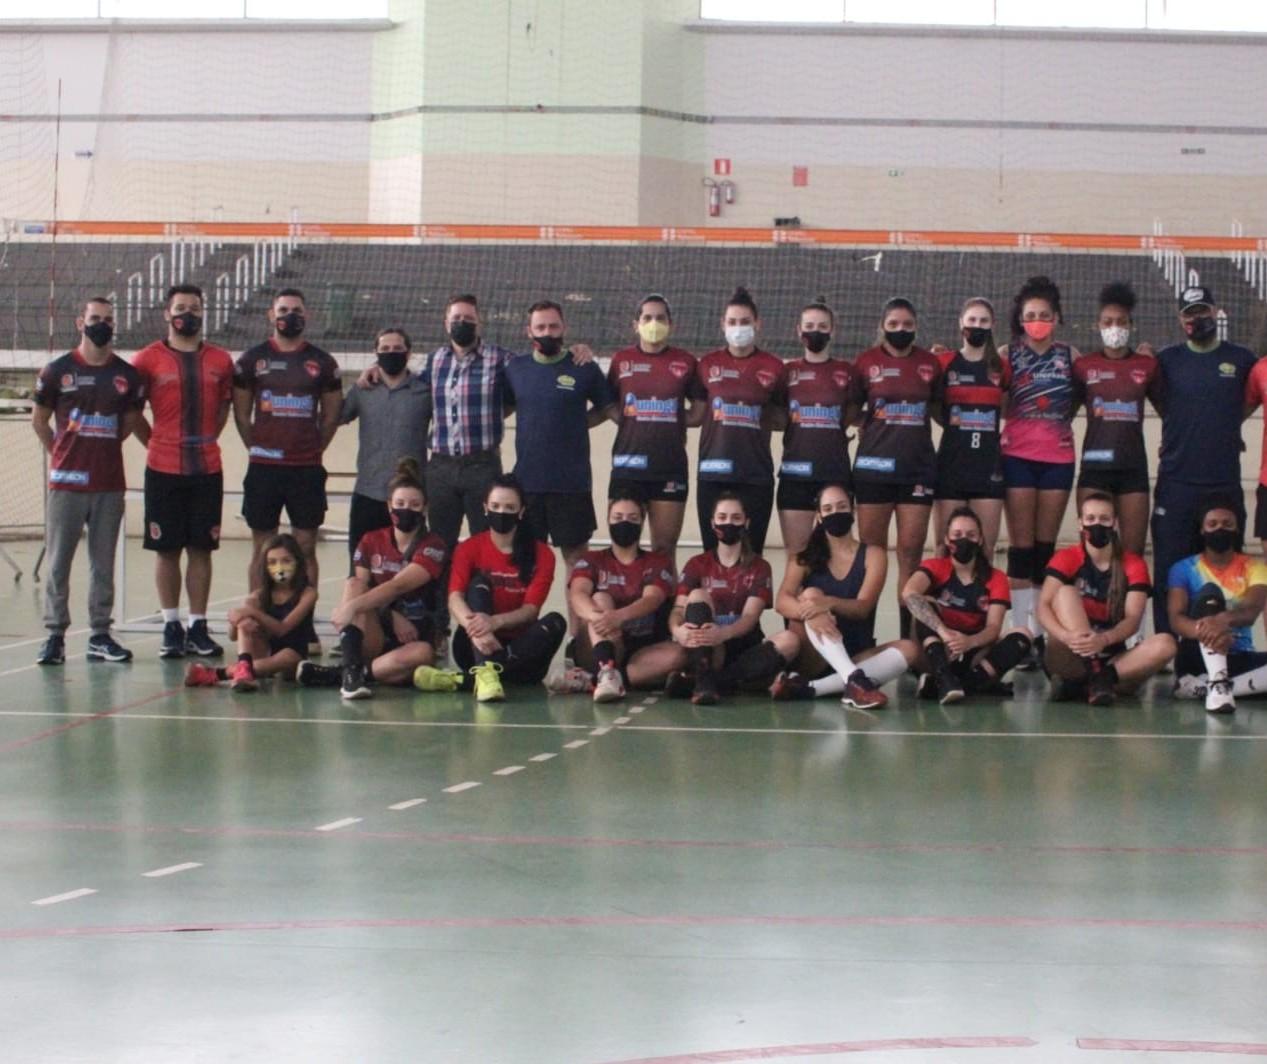 Amavolei passa a se chamar Unilife Maringá para nova temporada